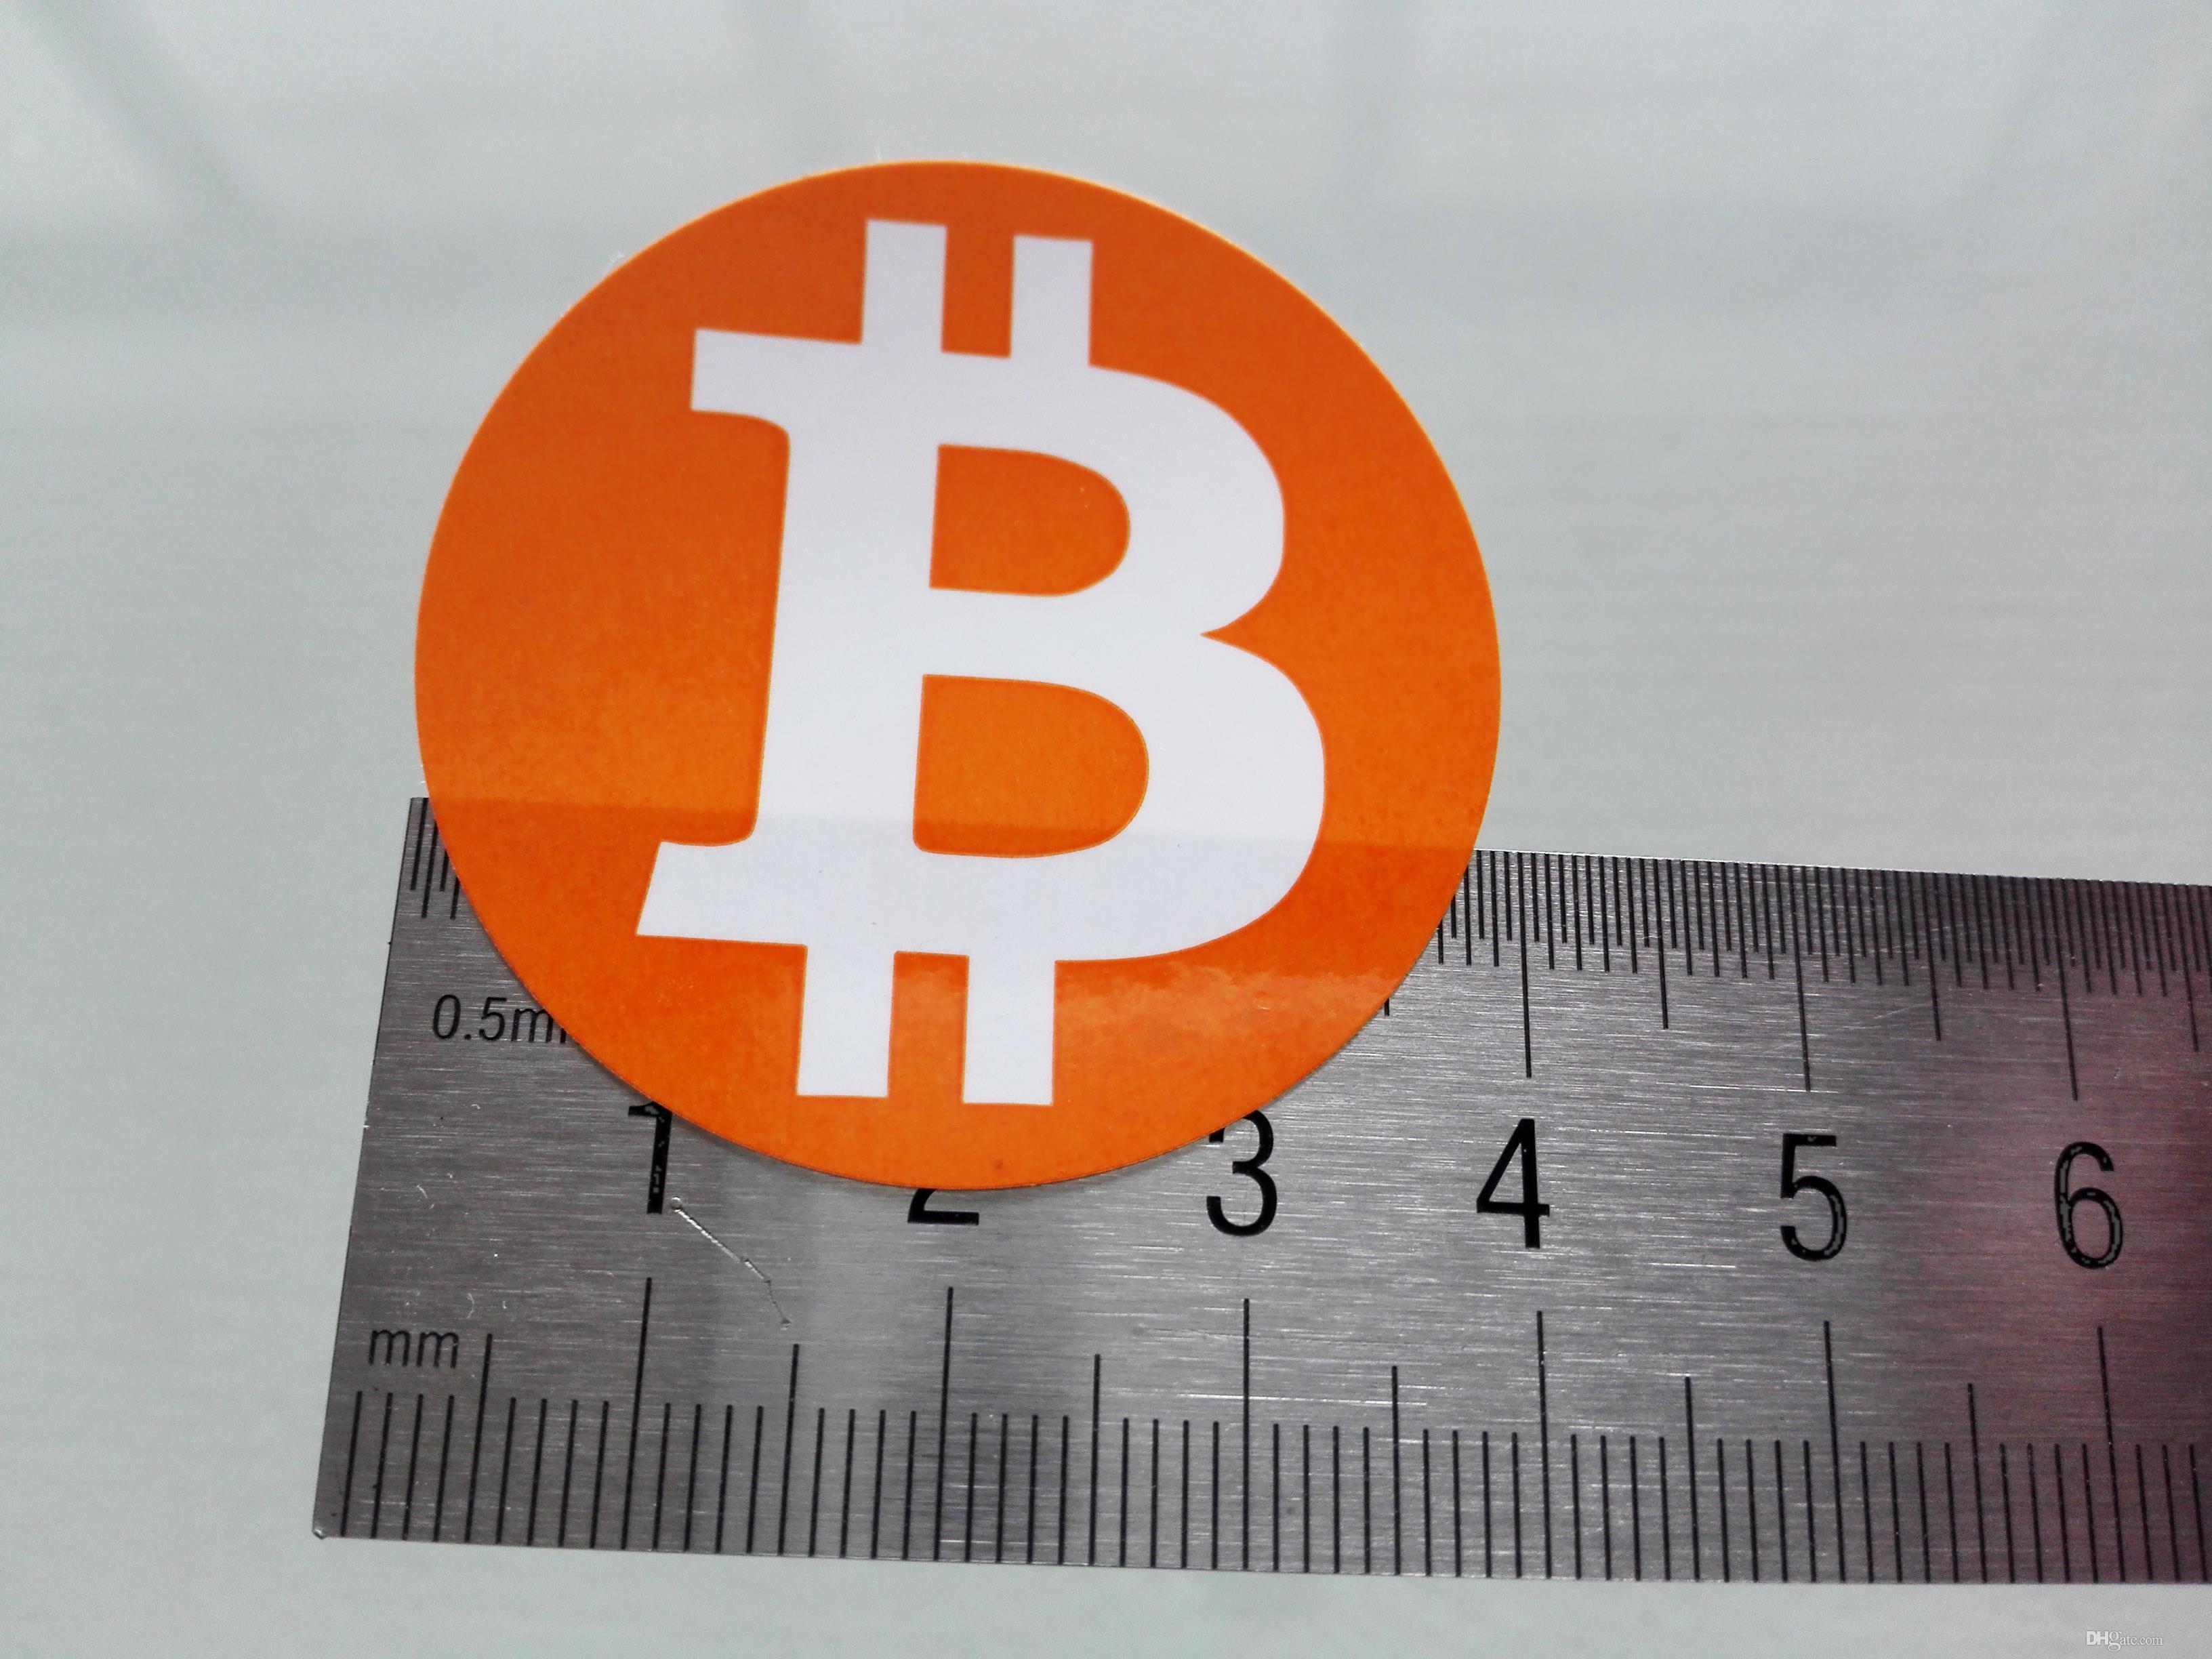 6000pcs 40mm диаметр биткойн логотип этикетка наклейка, оранжевый цвет печати на глянцевой бумаге, пункт Нет.FS18